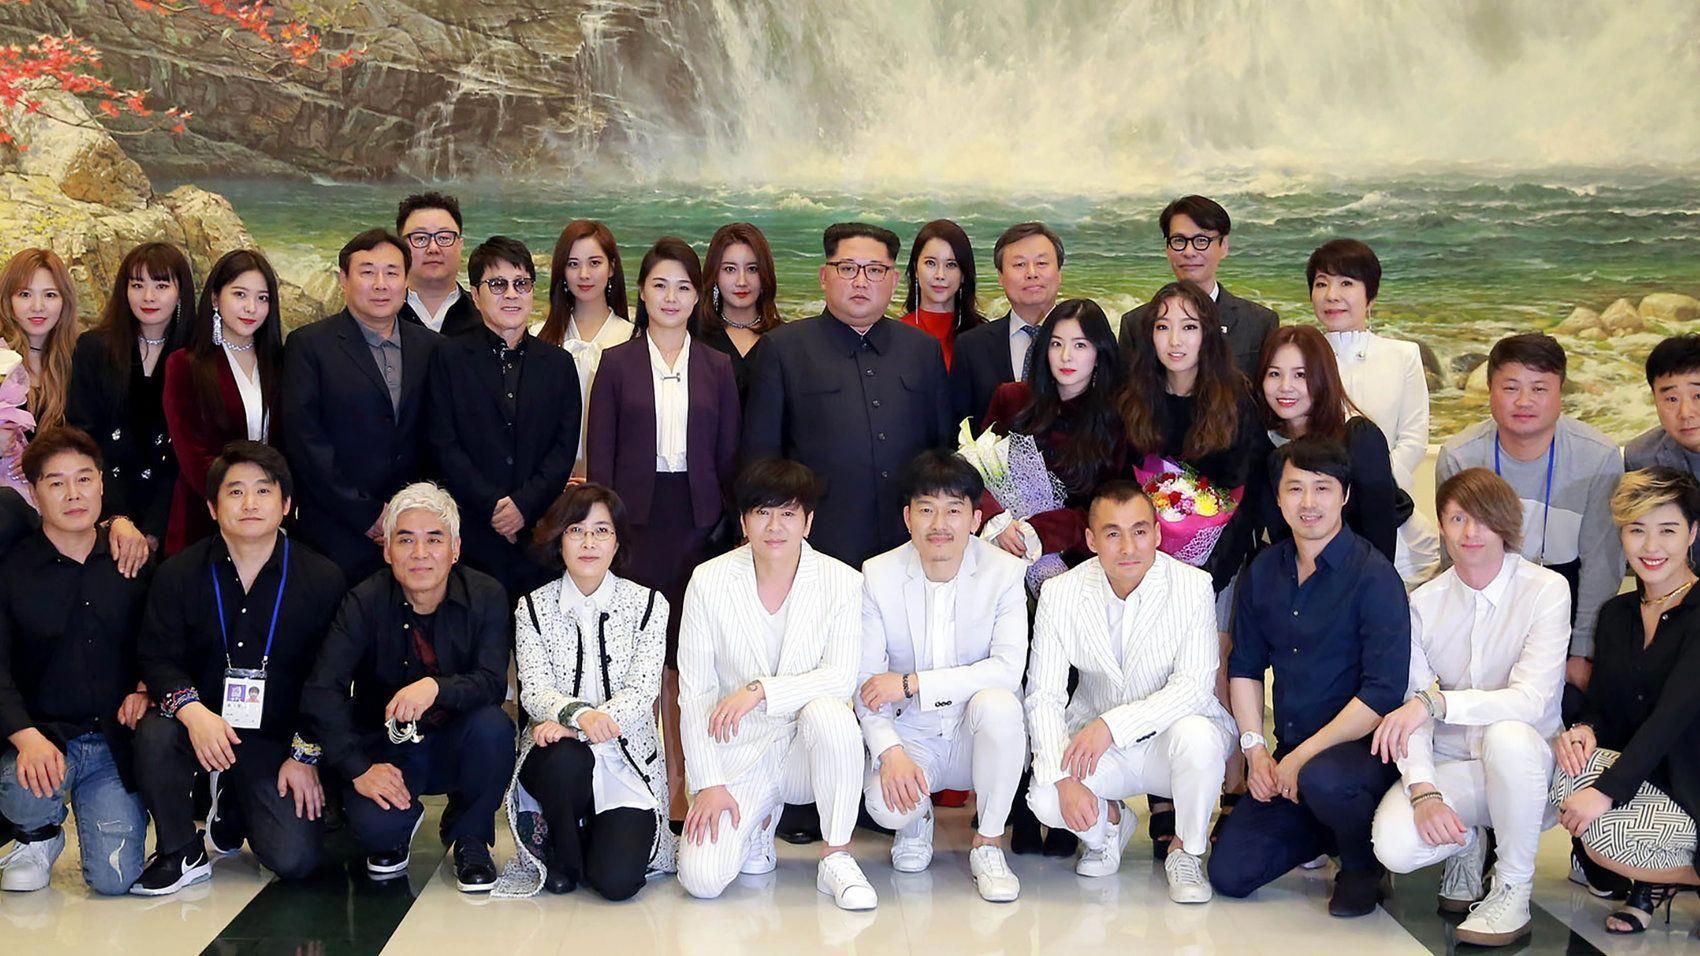 Kim Jong Un Was Deeply Moved After K Pop Performance The Record Npr Fashioninkorea Korean Pop Stars South Korea Culture Korean Pop